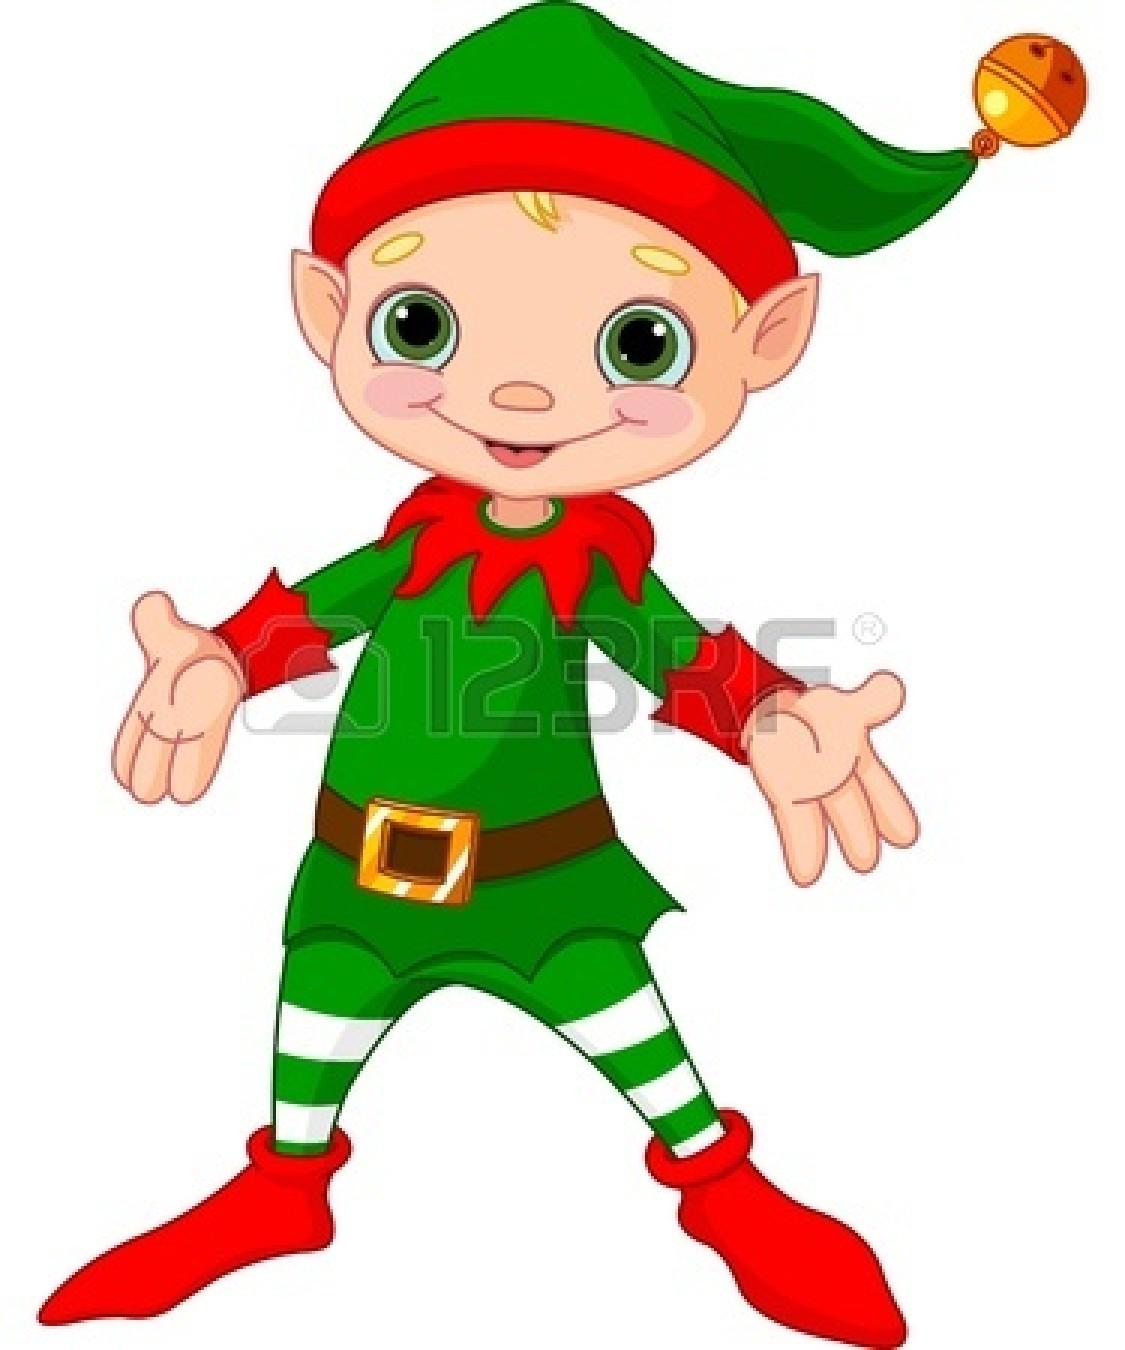 Santa and elves clipart vector royalty free stock Free Santa Elf Cliparts, Download Free Clip Art, Free Clip Art on ... vector royalty free stock